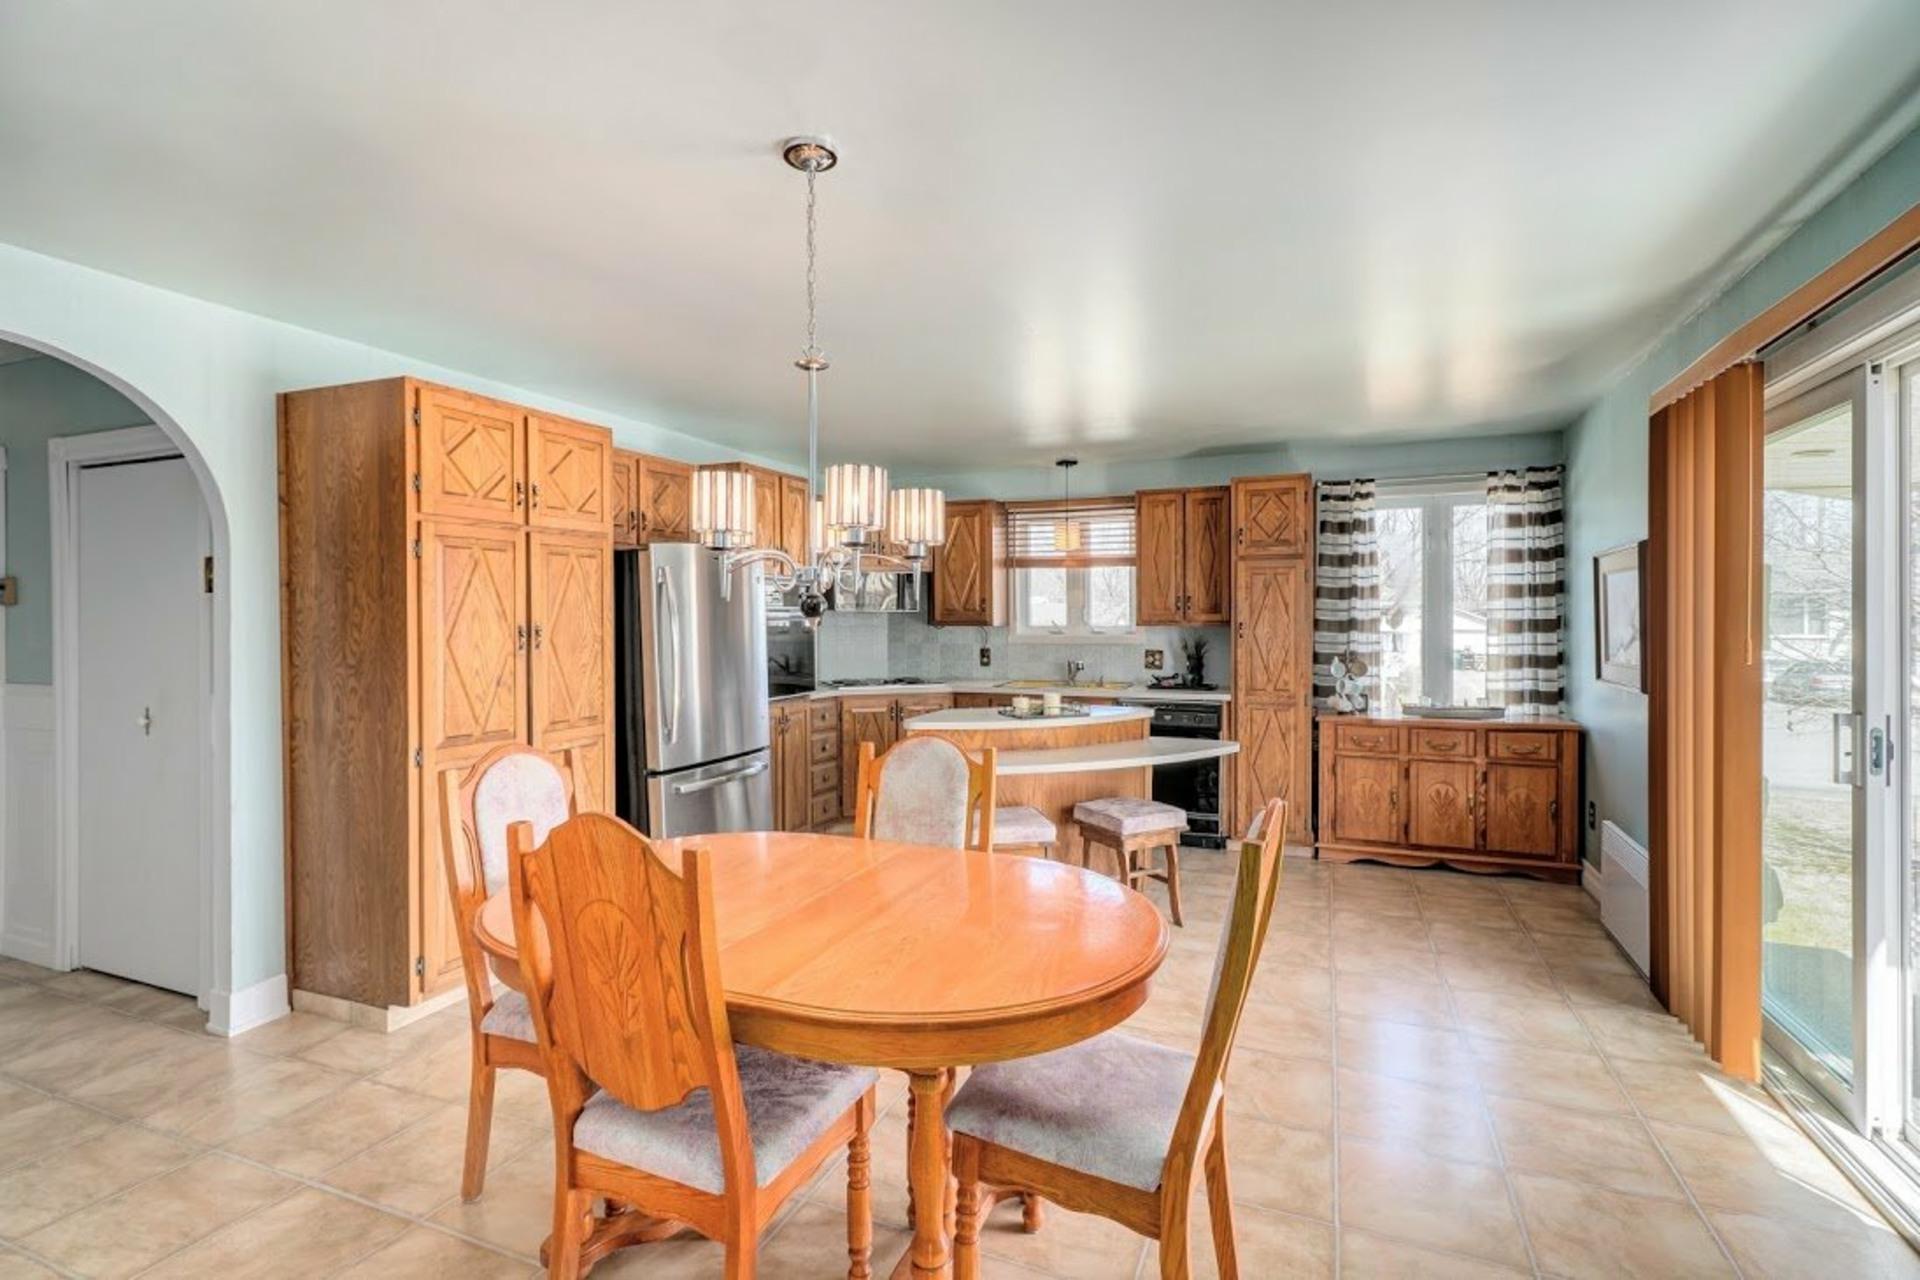 image 6 - House For sale Notre-Dame-des-Prairies - 9 rooms